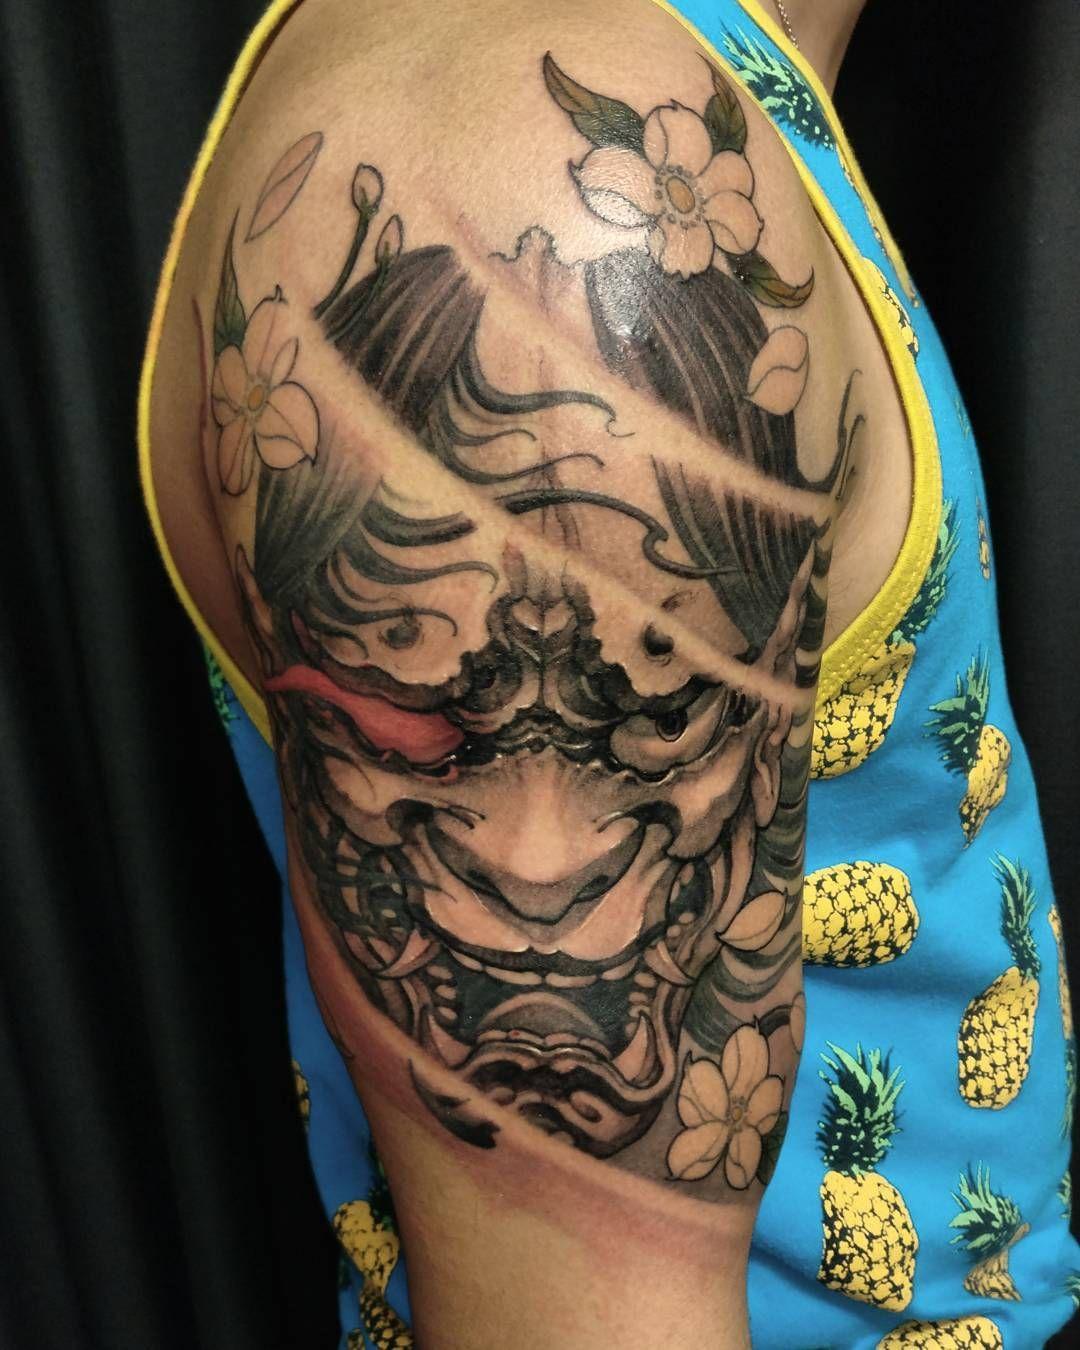 David Hoang On Instagram Back To Back Tiger Tattoo: Hannya Completed. #hannya #chronicink #asiantattoo